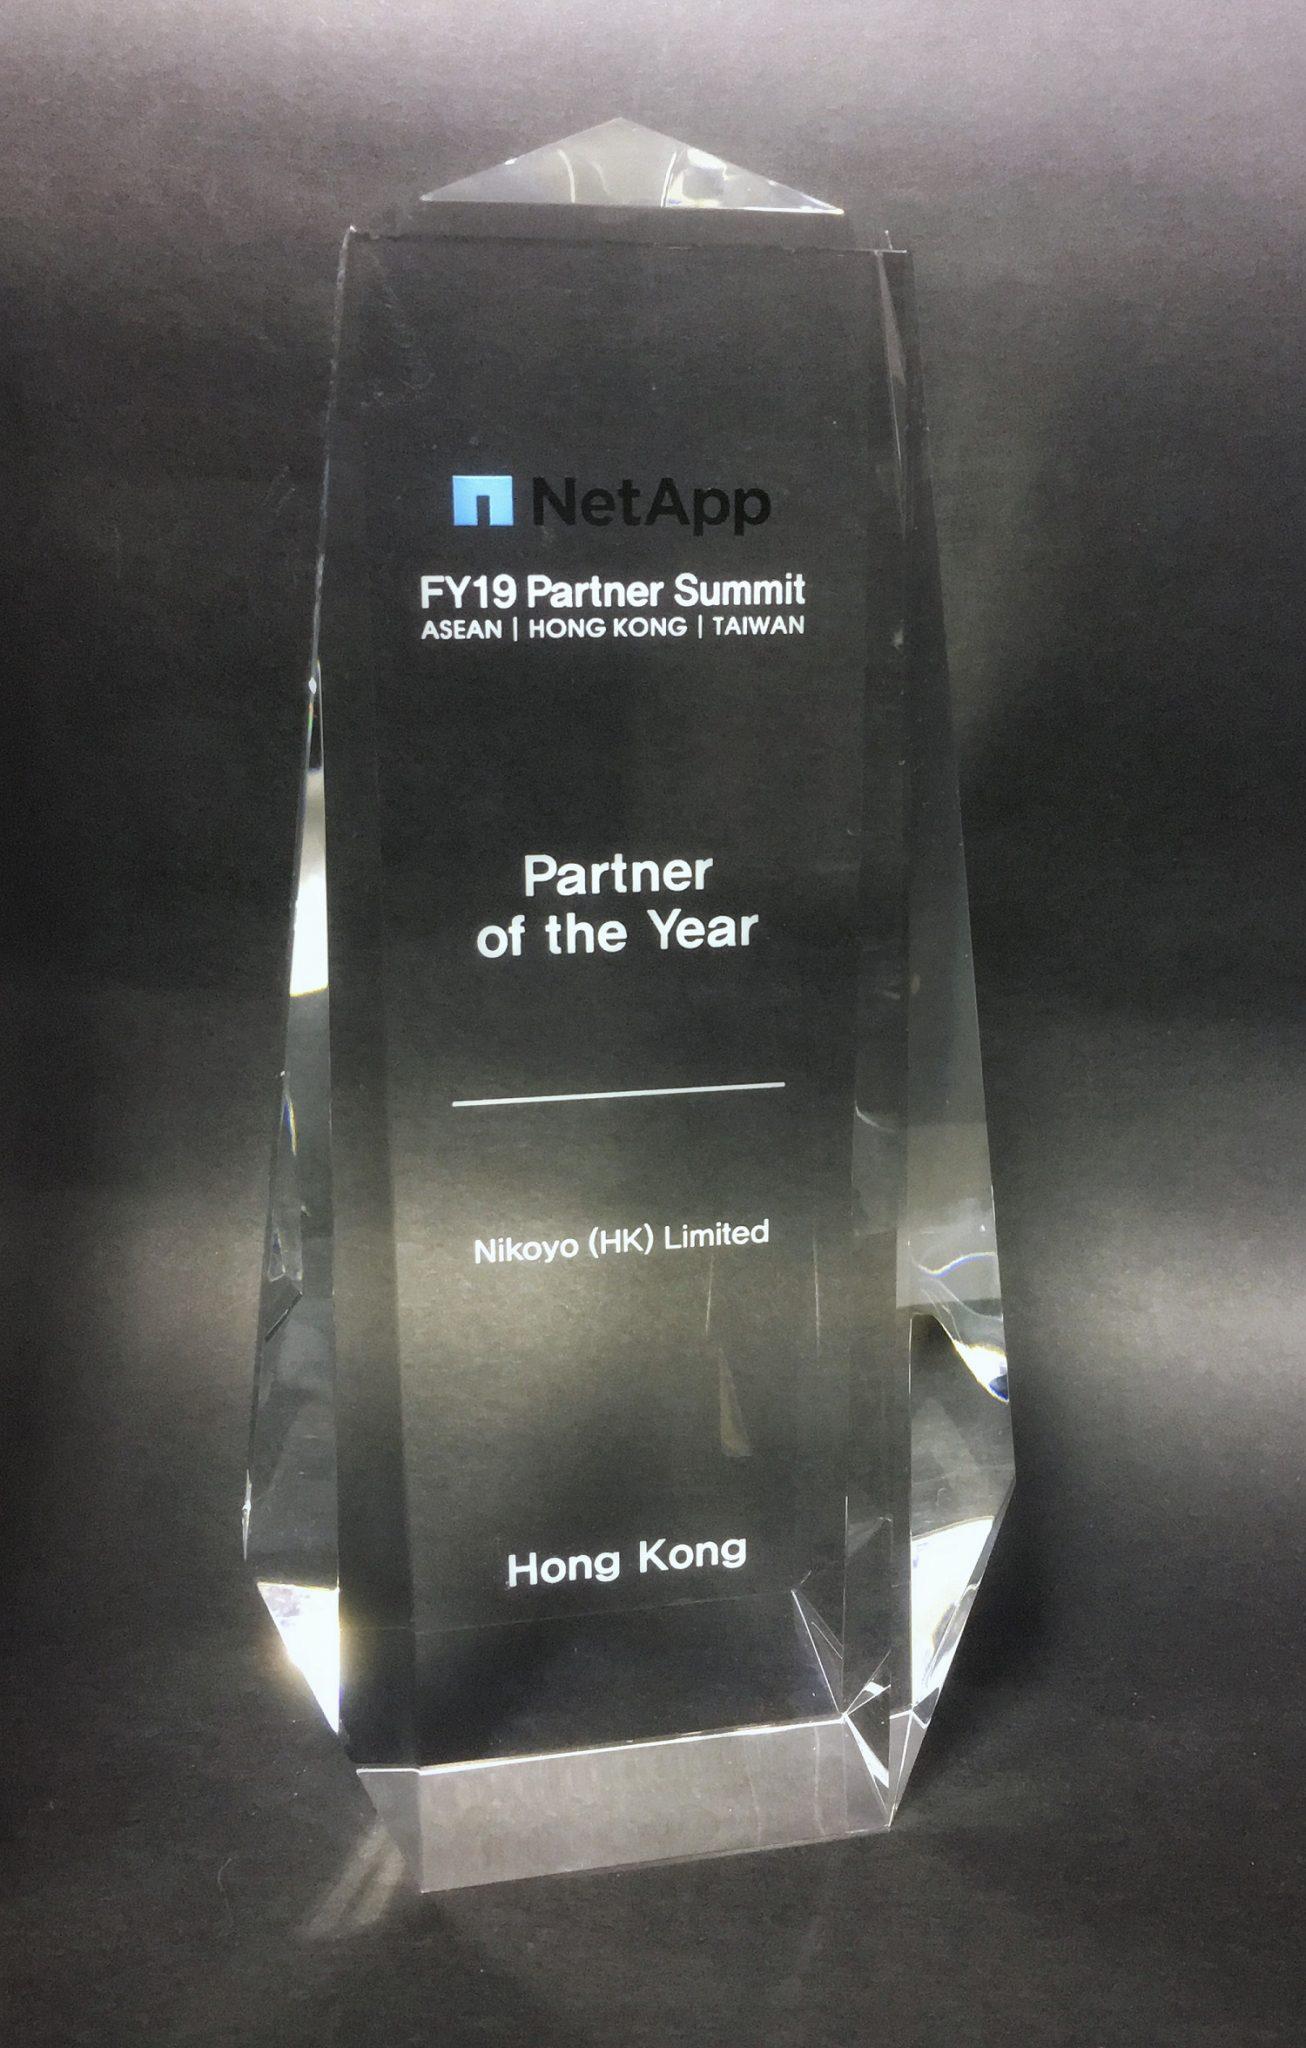 NetApp FY19 Partner of the Year Hong Kong